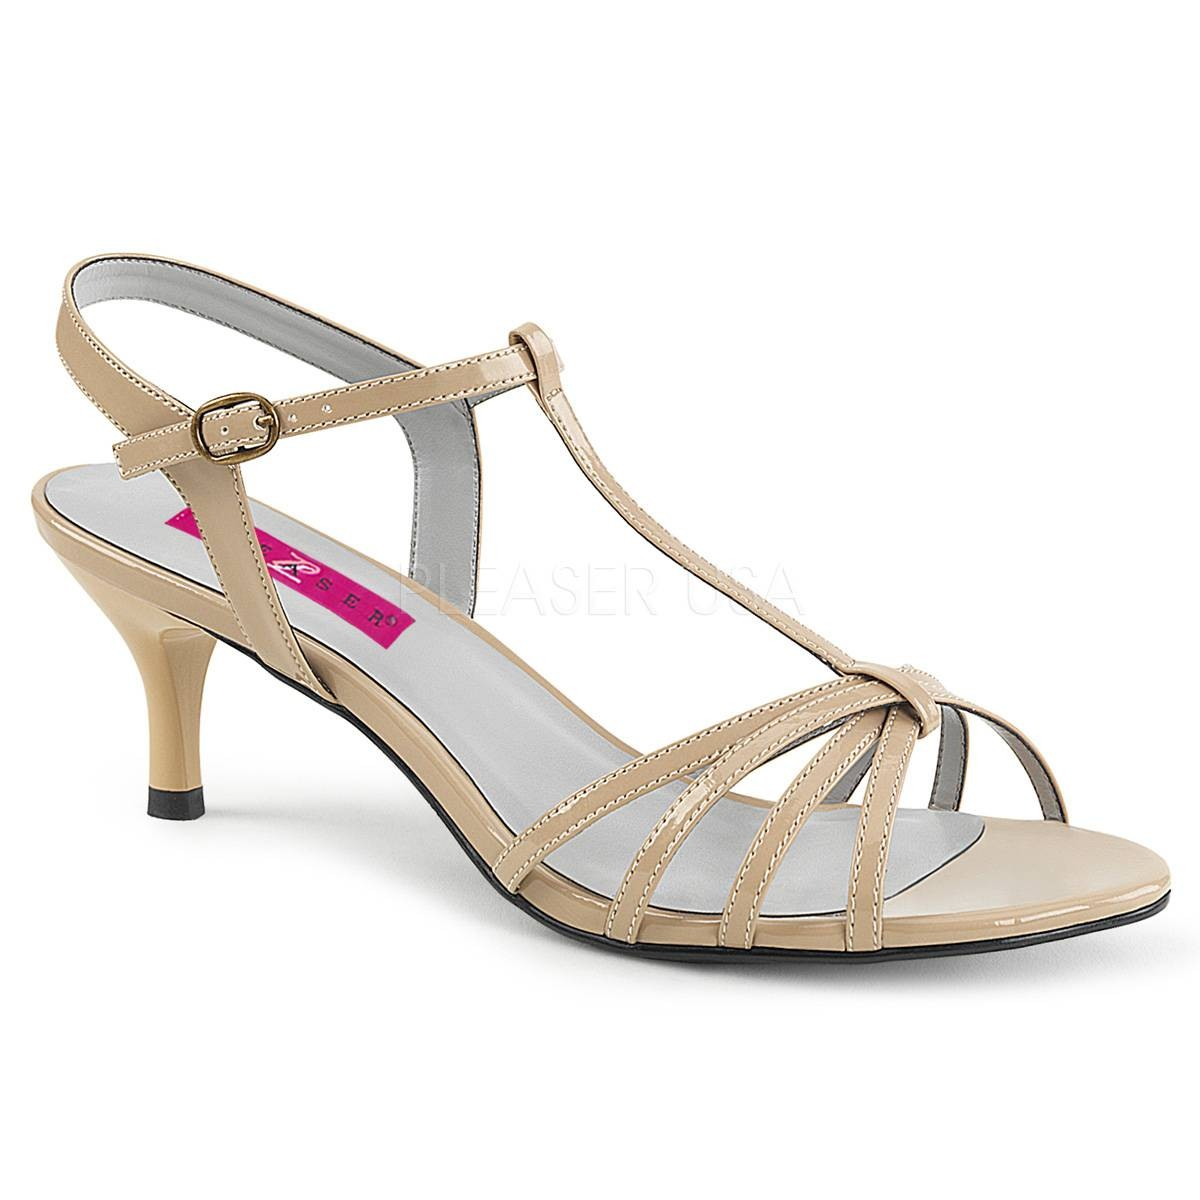 Sandalen - KITTEN 06 ° Damen Sandalette ° BeigeGlänzend ° Pleaser Pink Label  - Onlineshop RedSixty